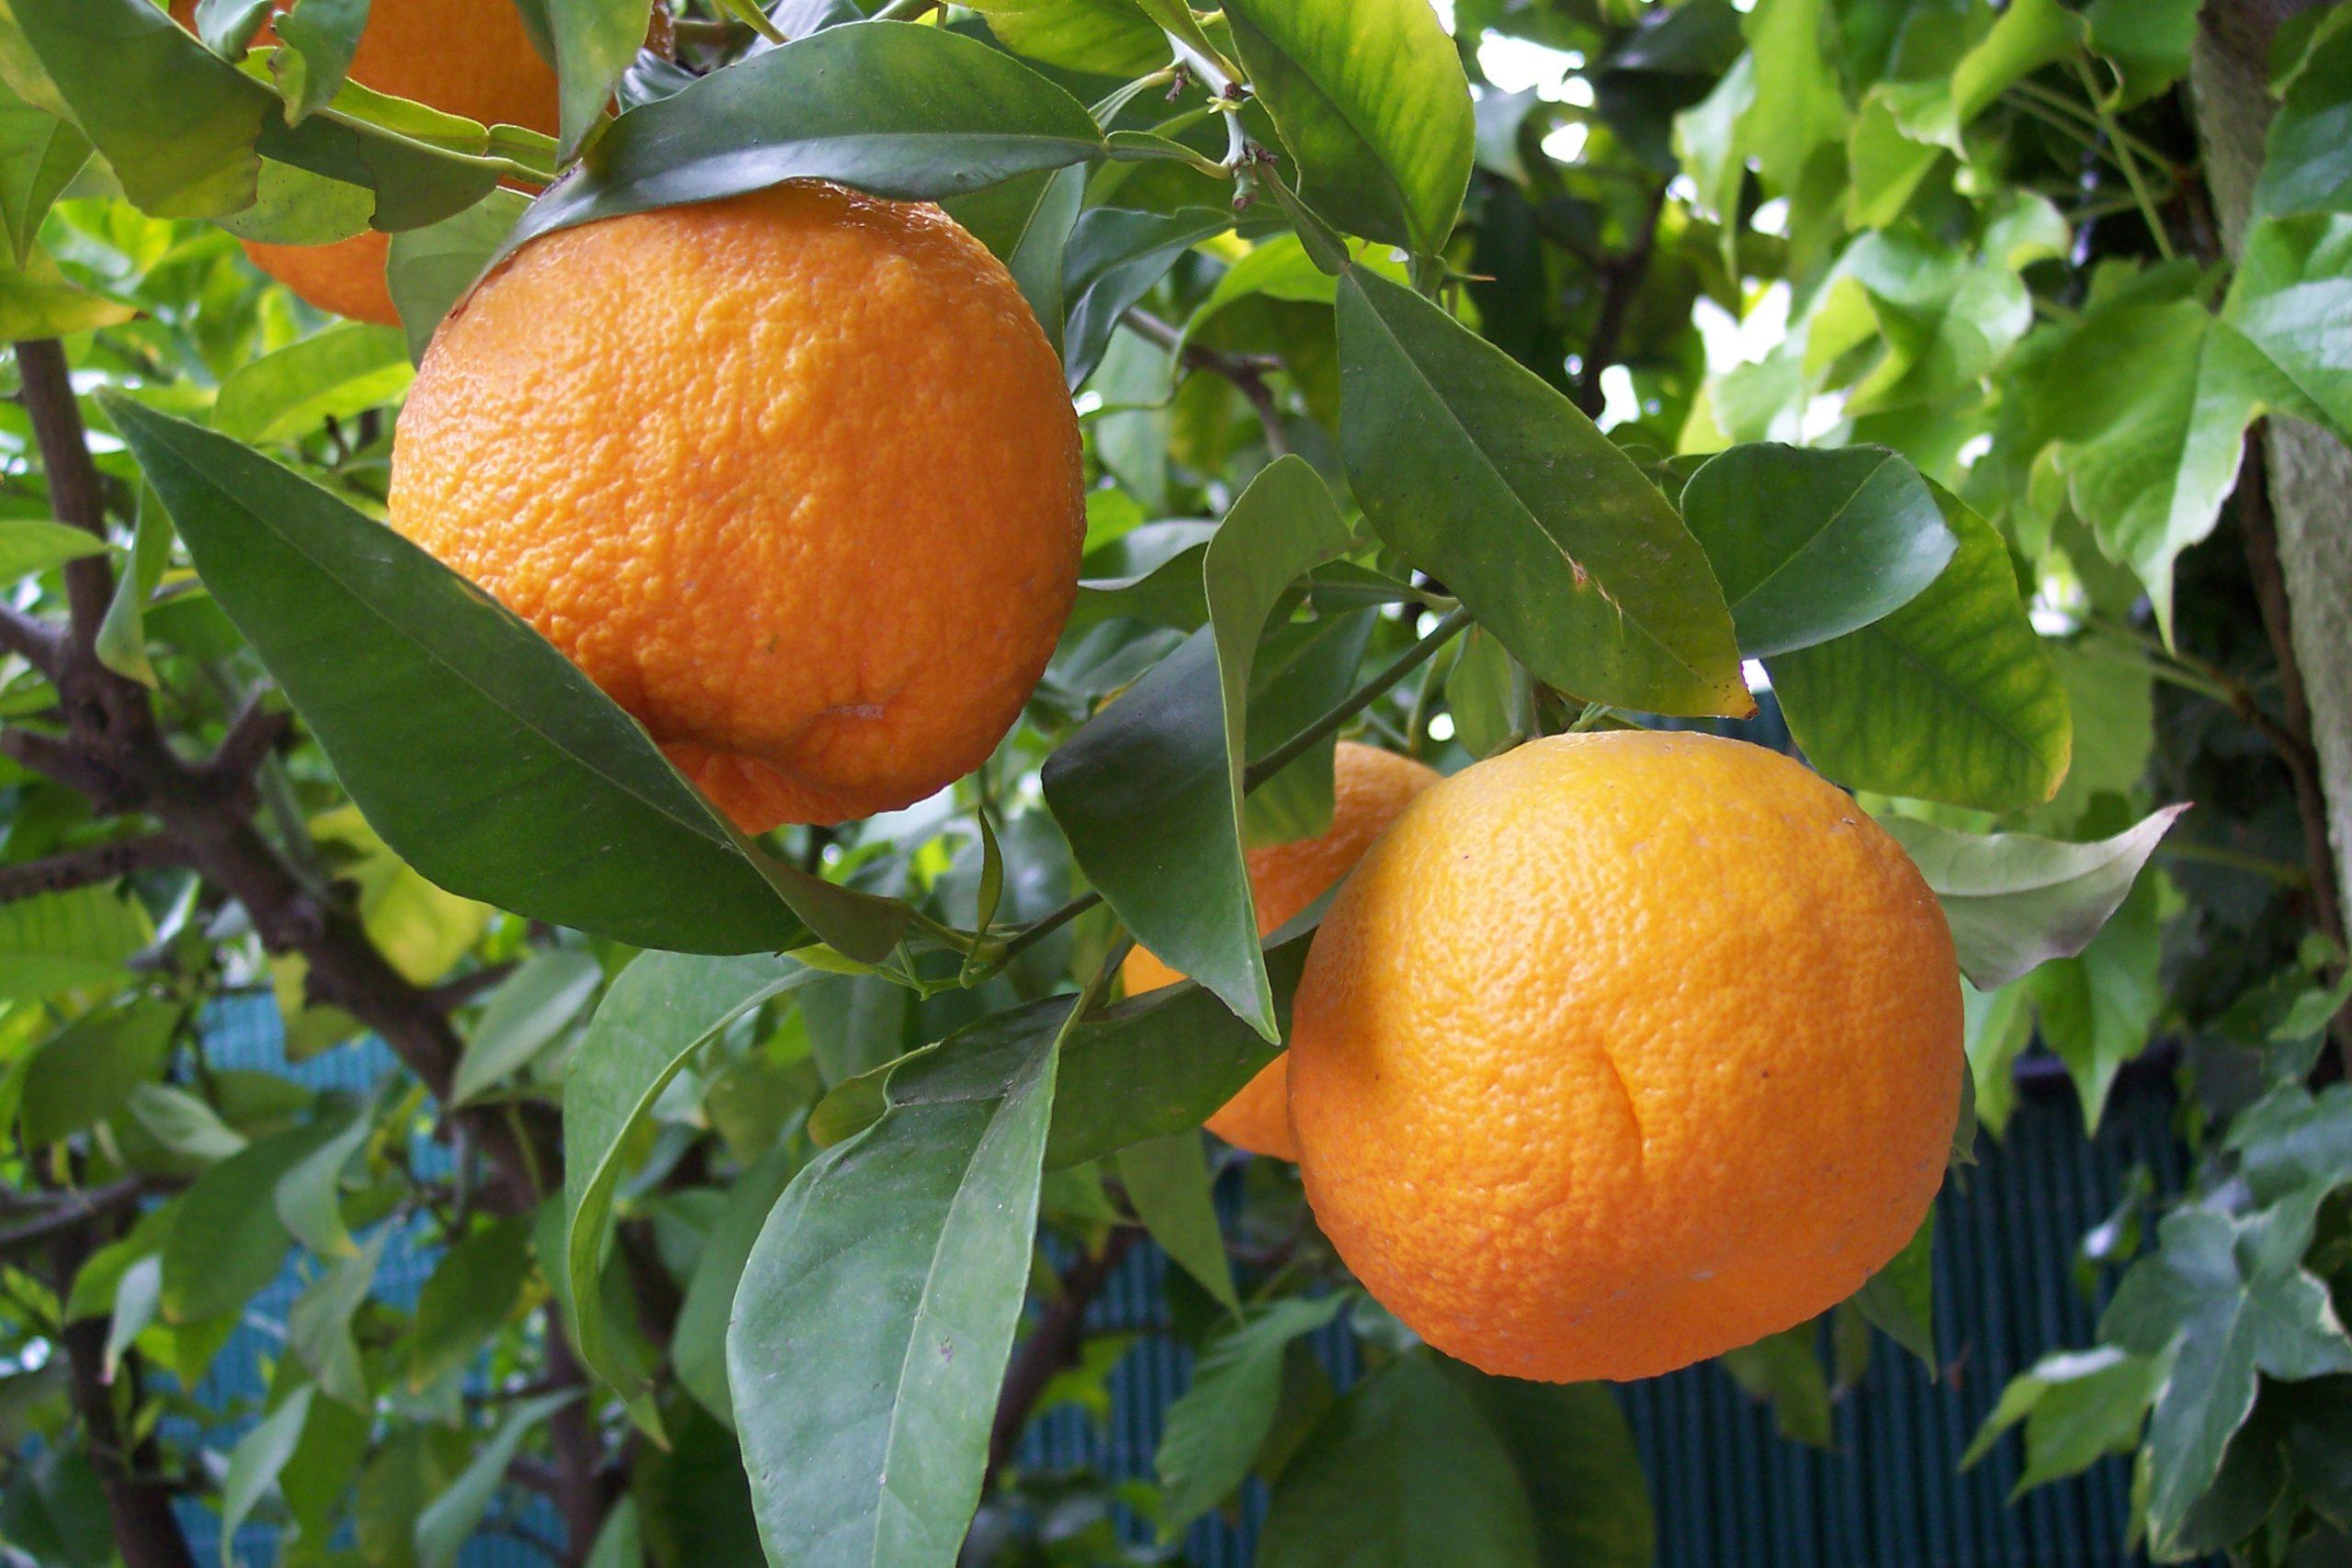 bitter-orange-meticore